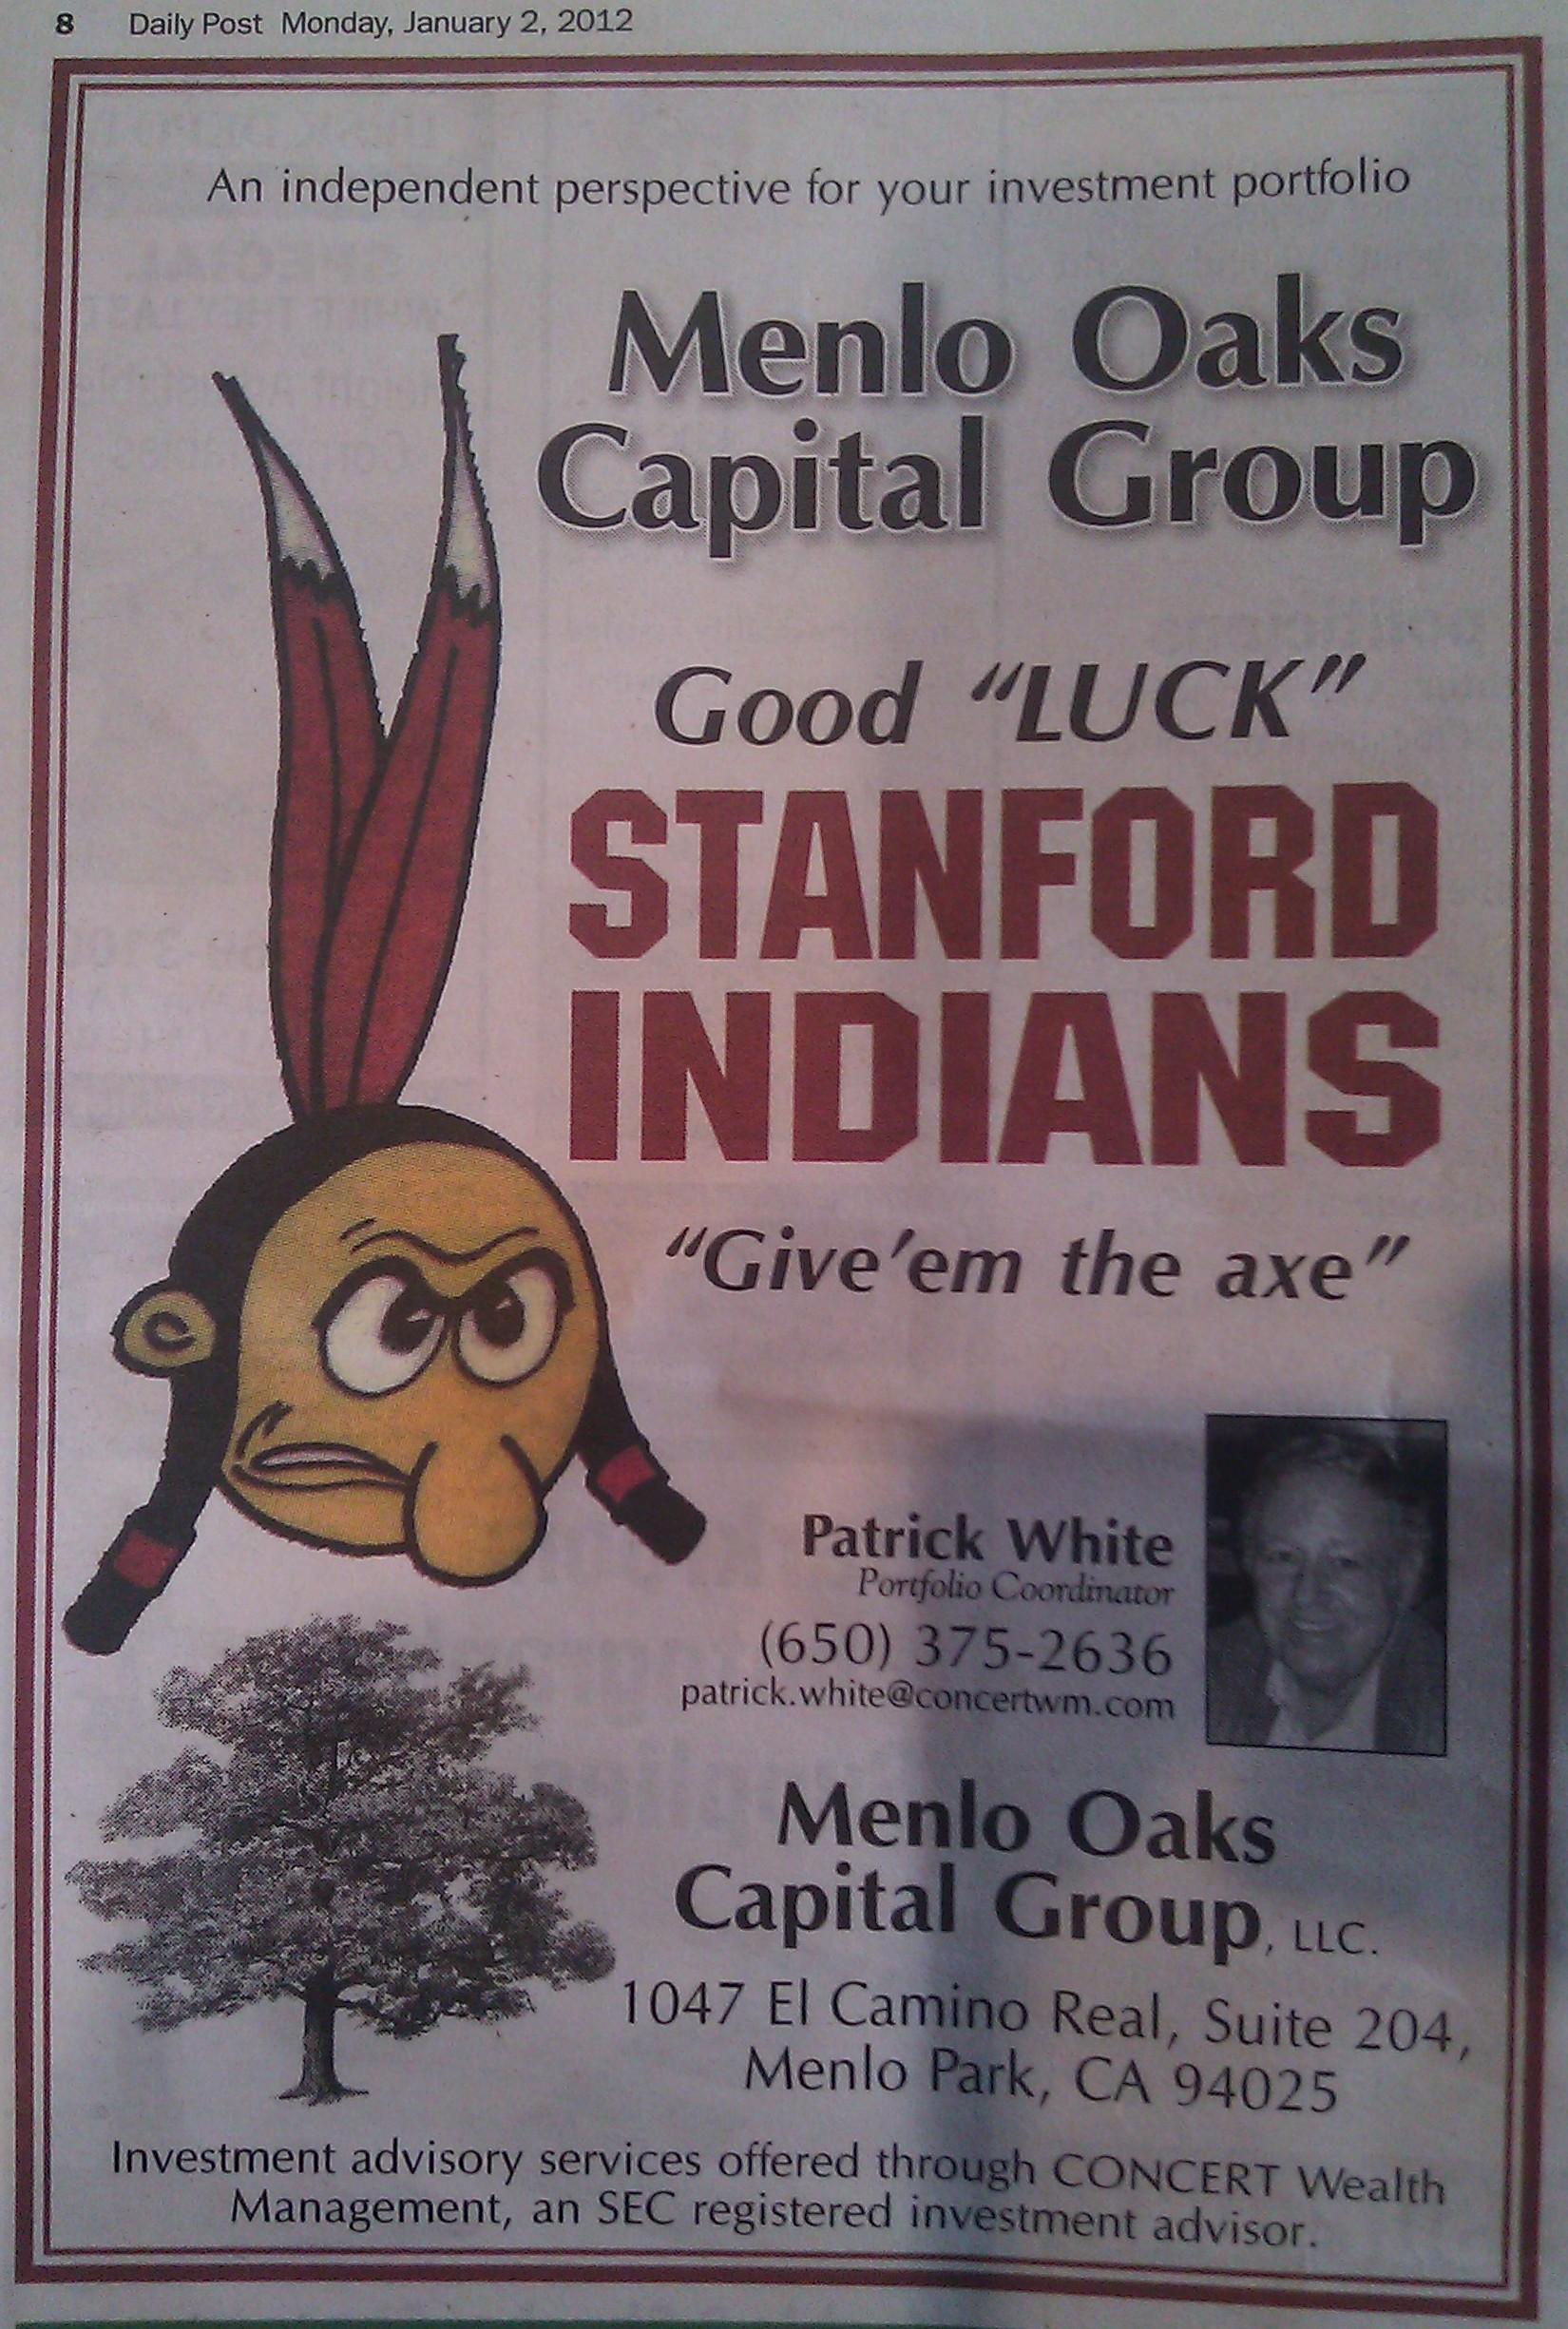 stanford-indians.jpg